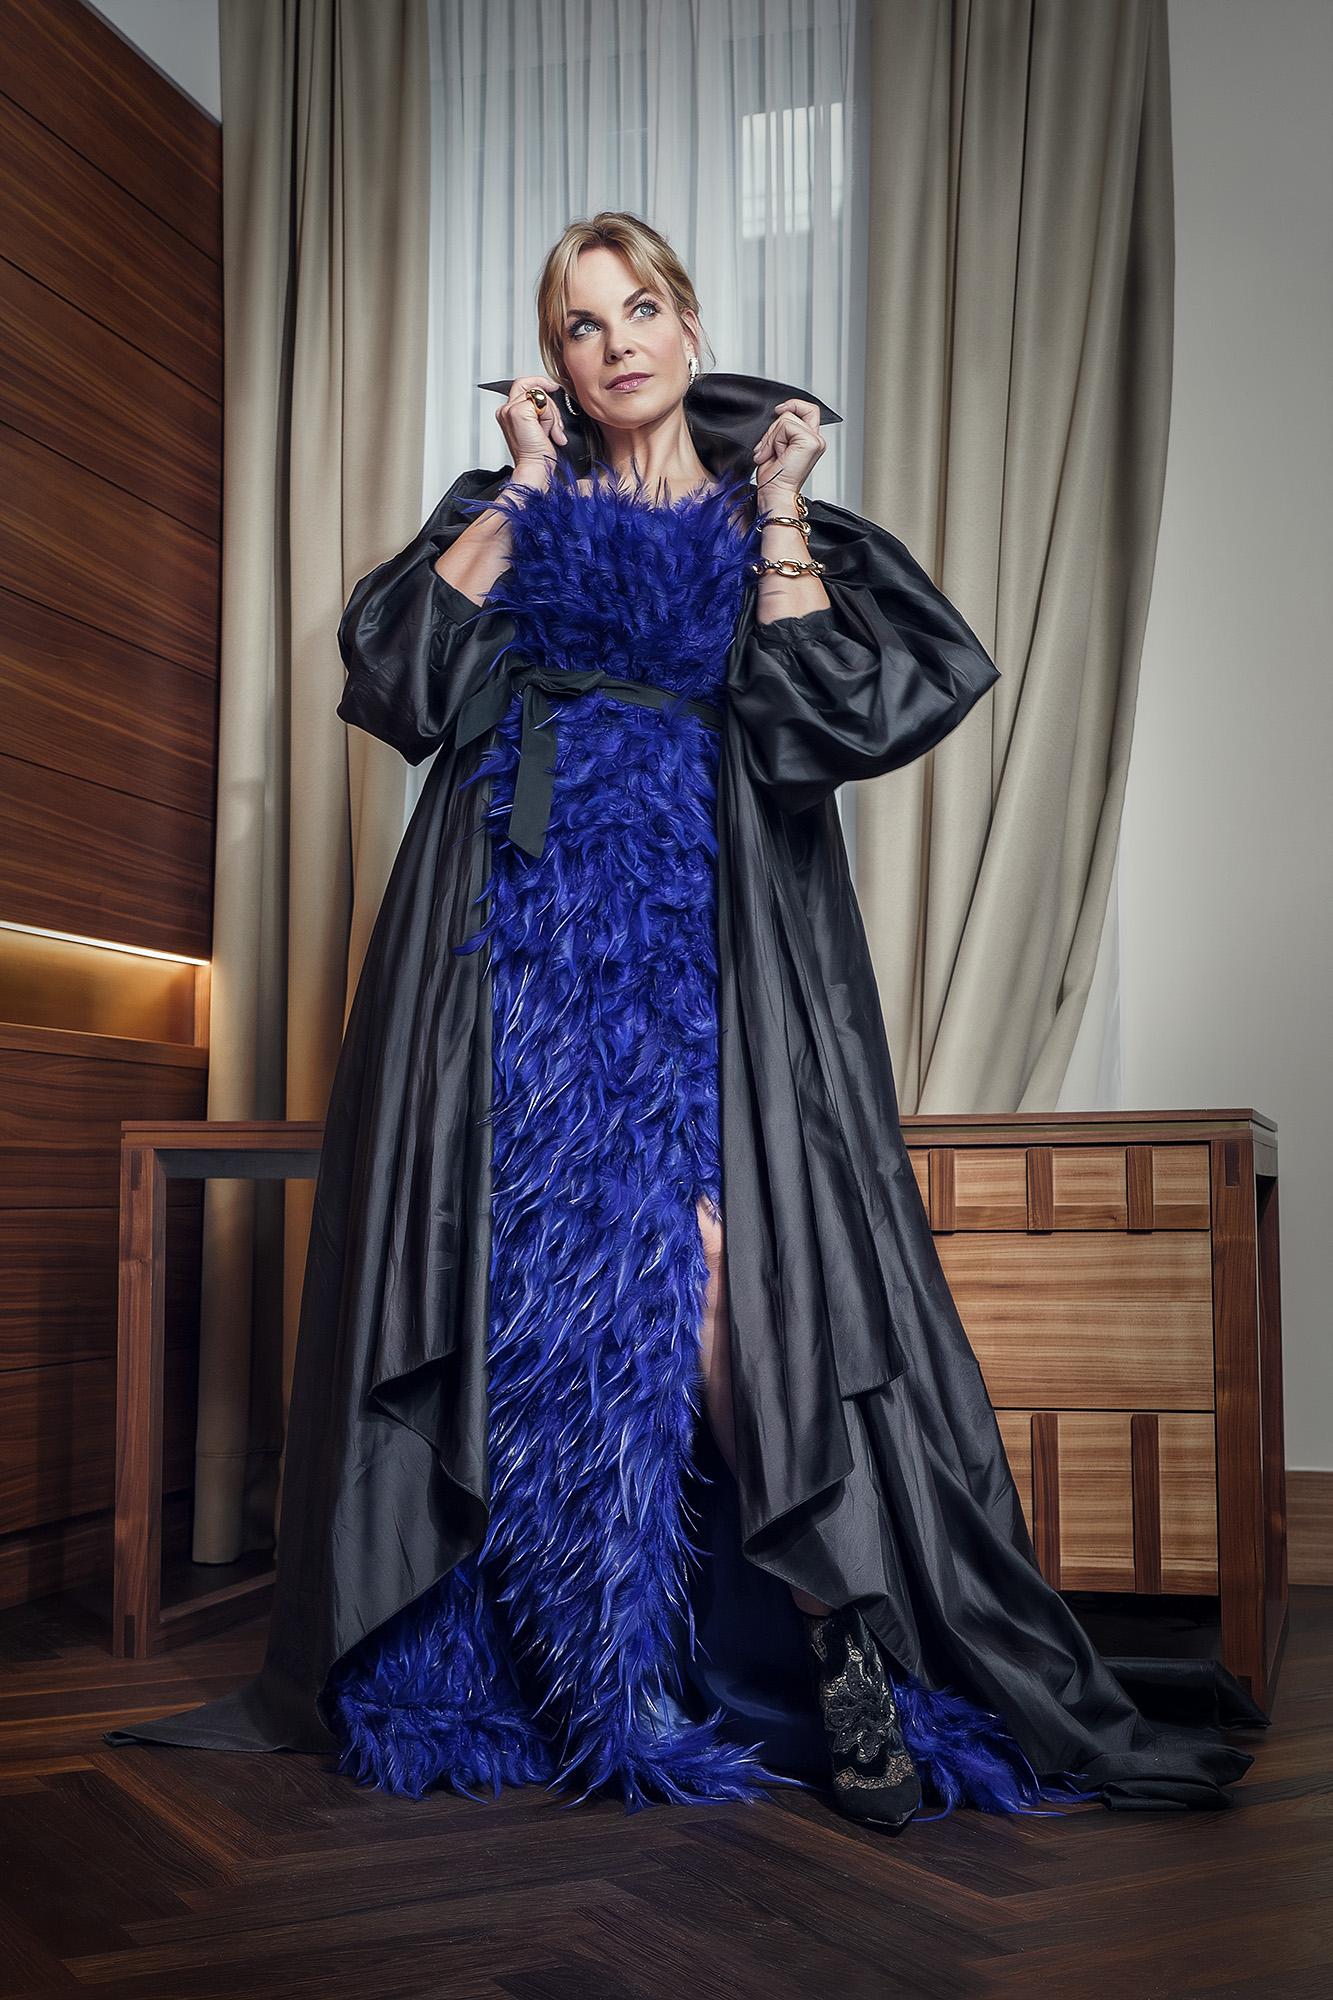 Fotoshooting Elina Garancia - 2021-04-09 - The Ritz Carlton Vienna, Wien